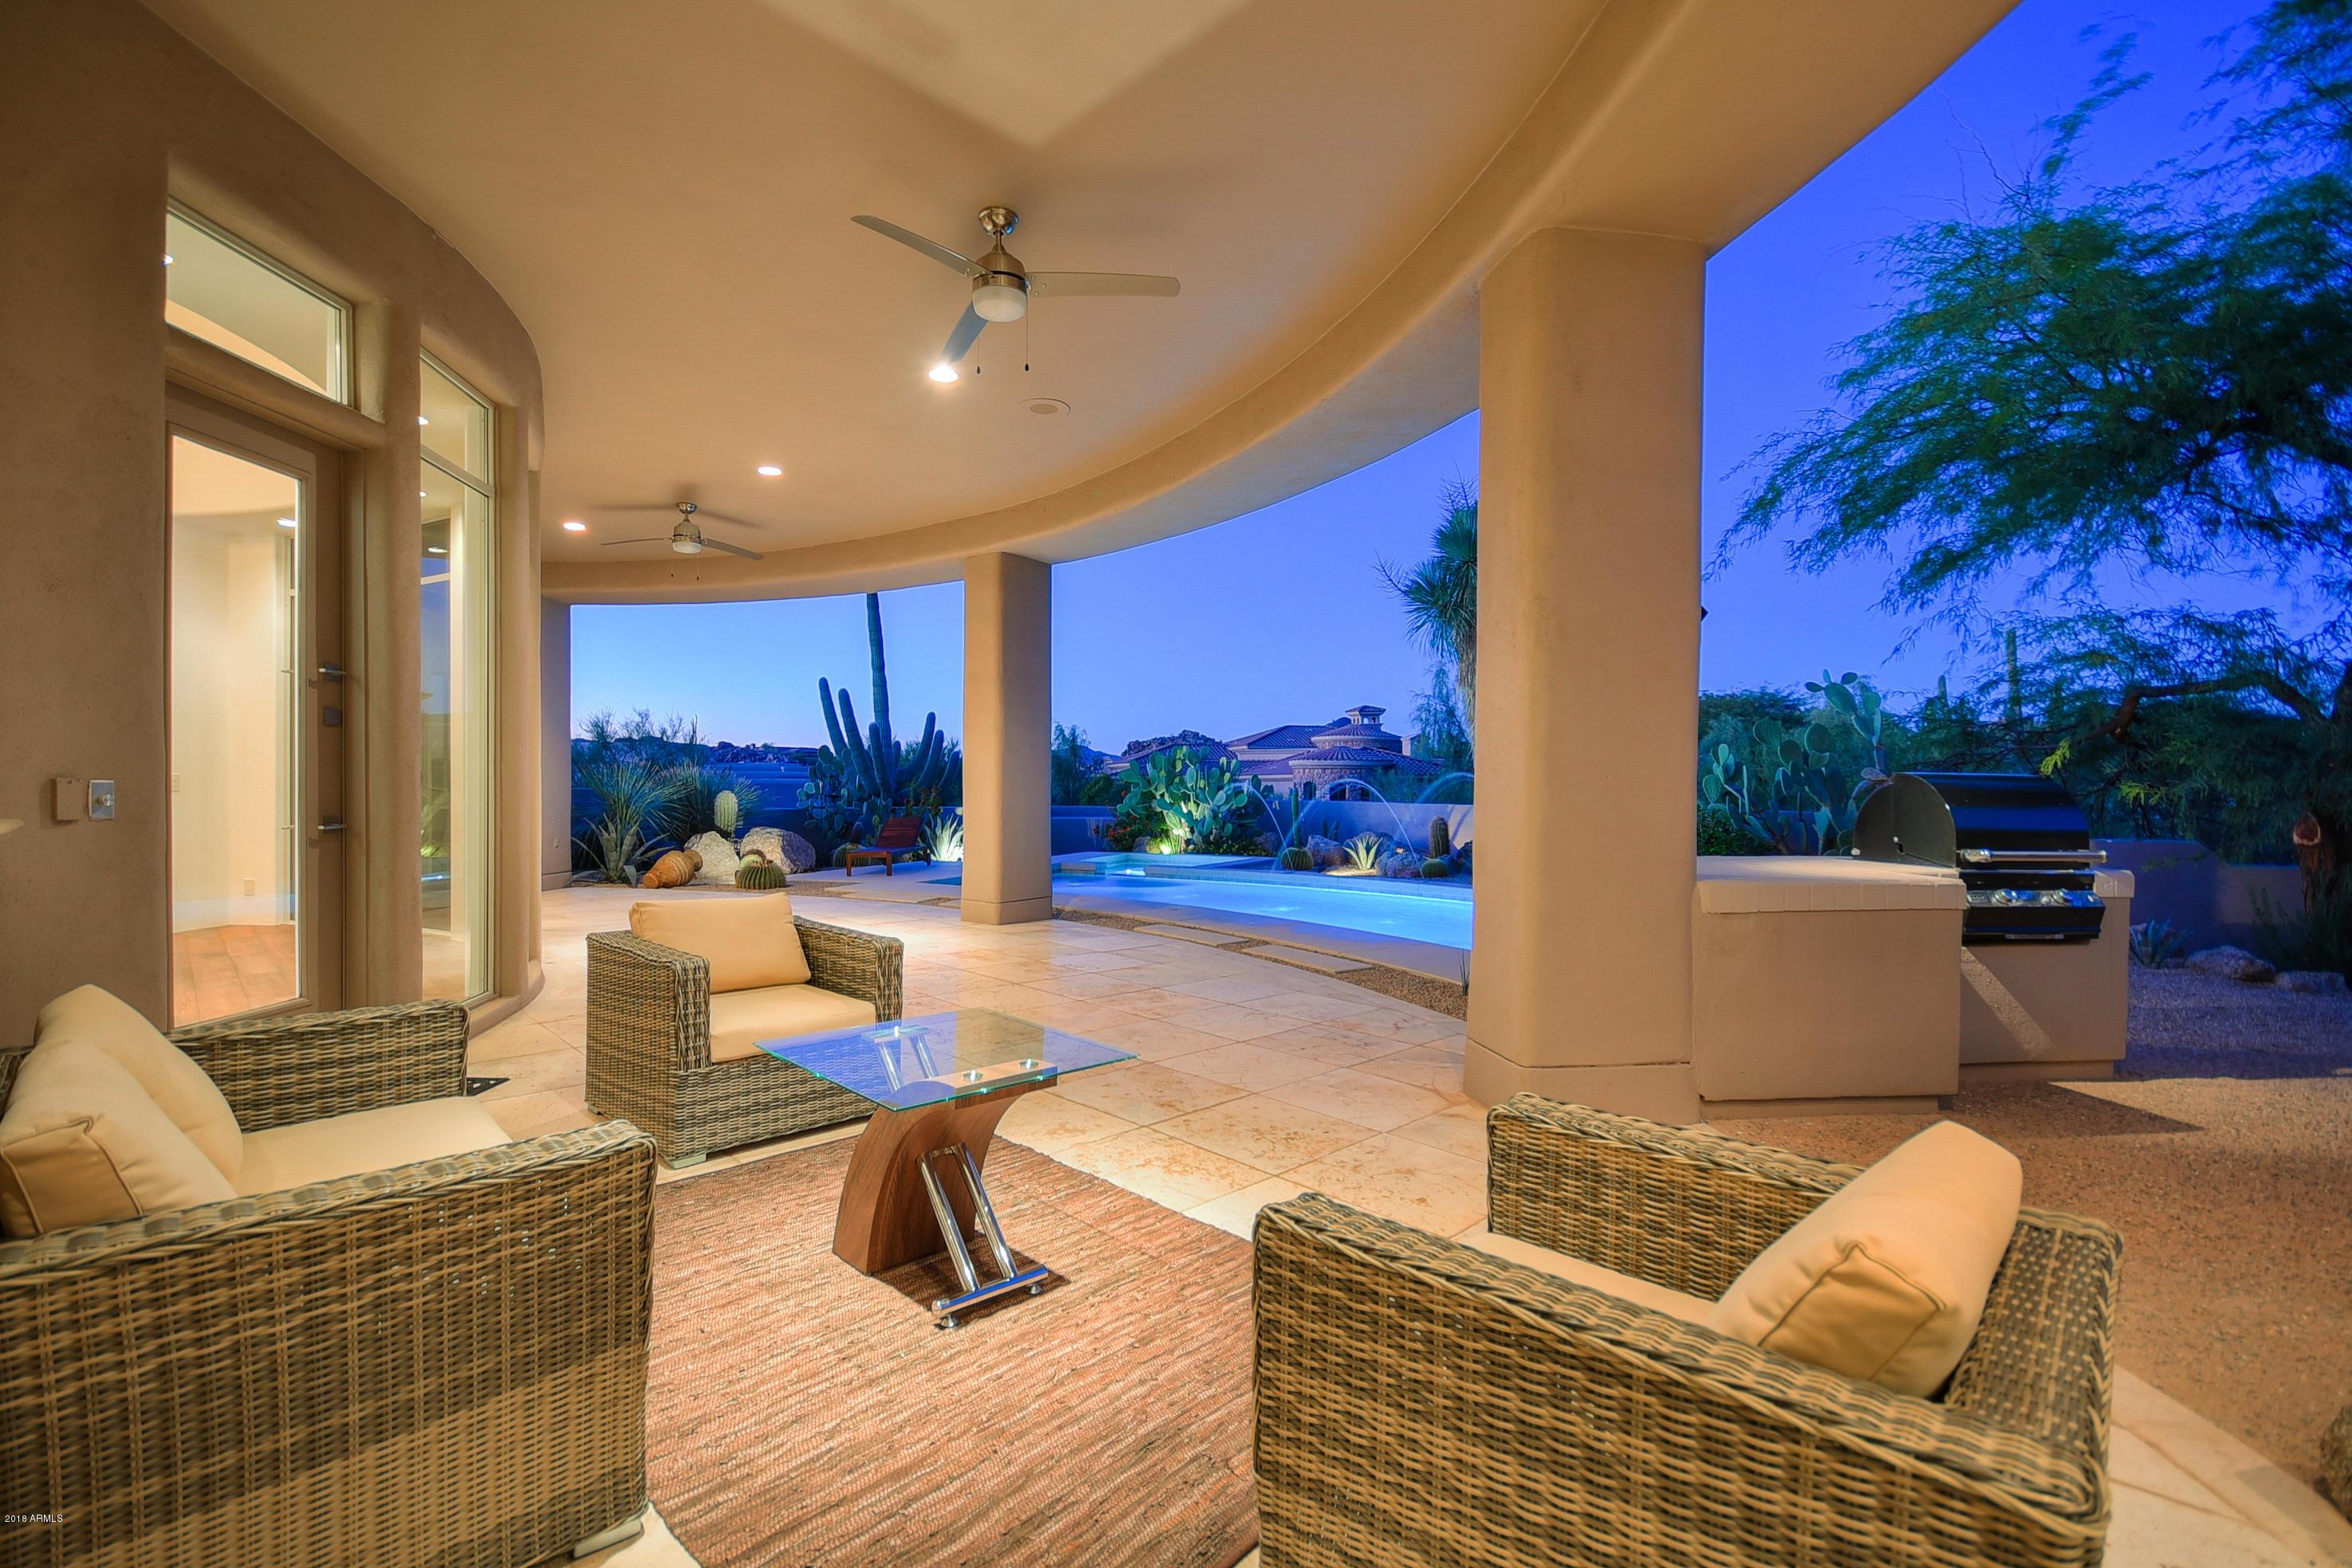 MLS 5832833 10448 E SKINNER Drive, Scottsdale, AZ 85262 Scottsdale AZ Candlewood Estates